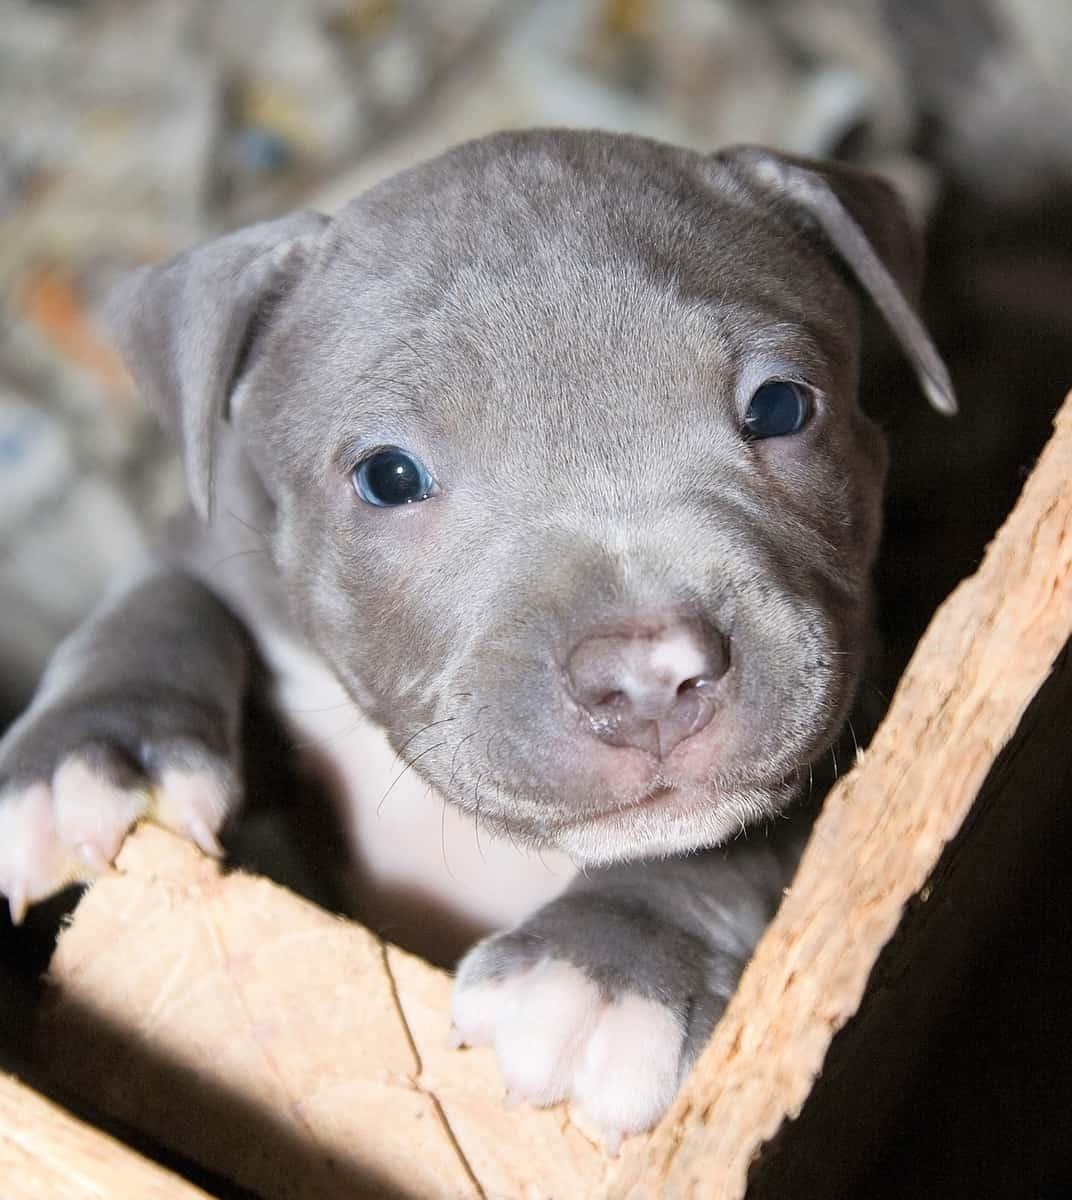 Gray Pitbull puppy with blue eyes